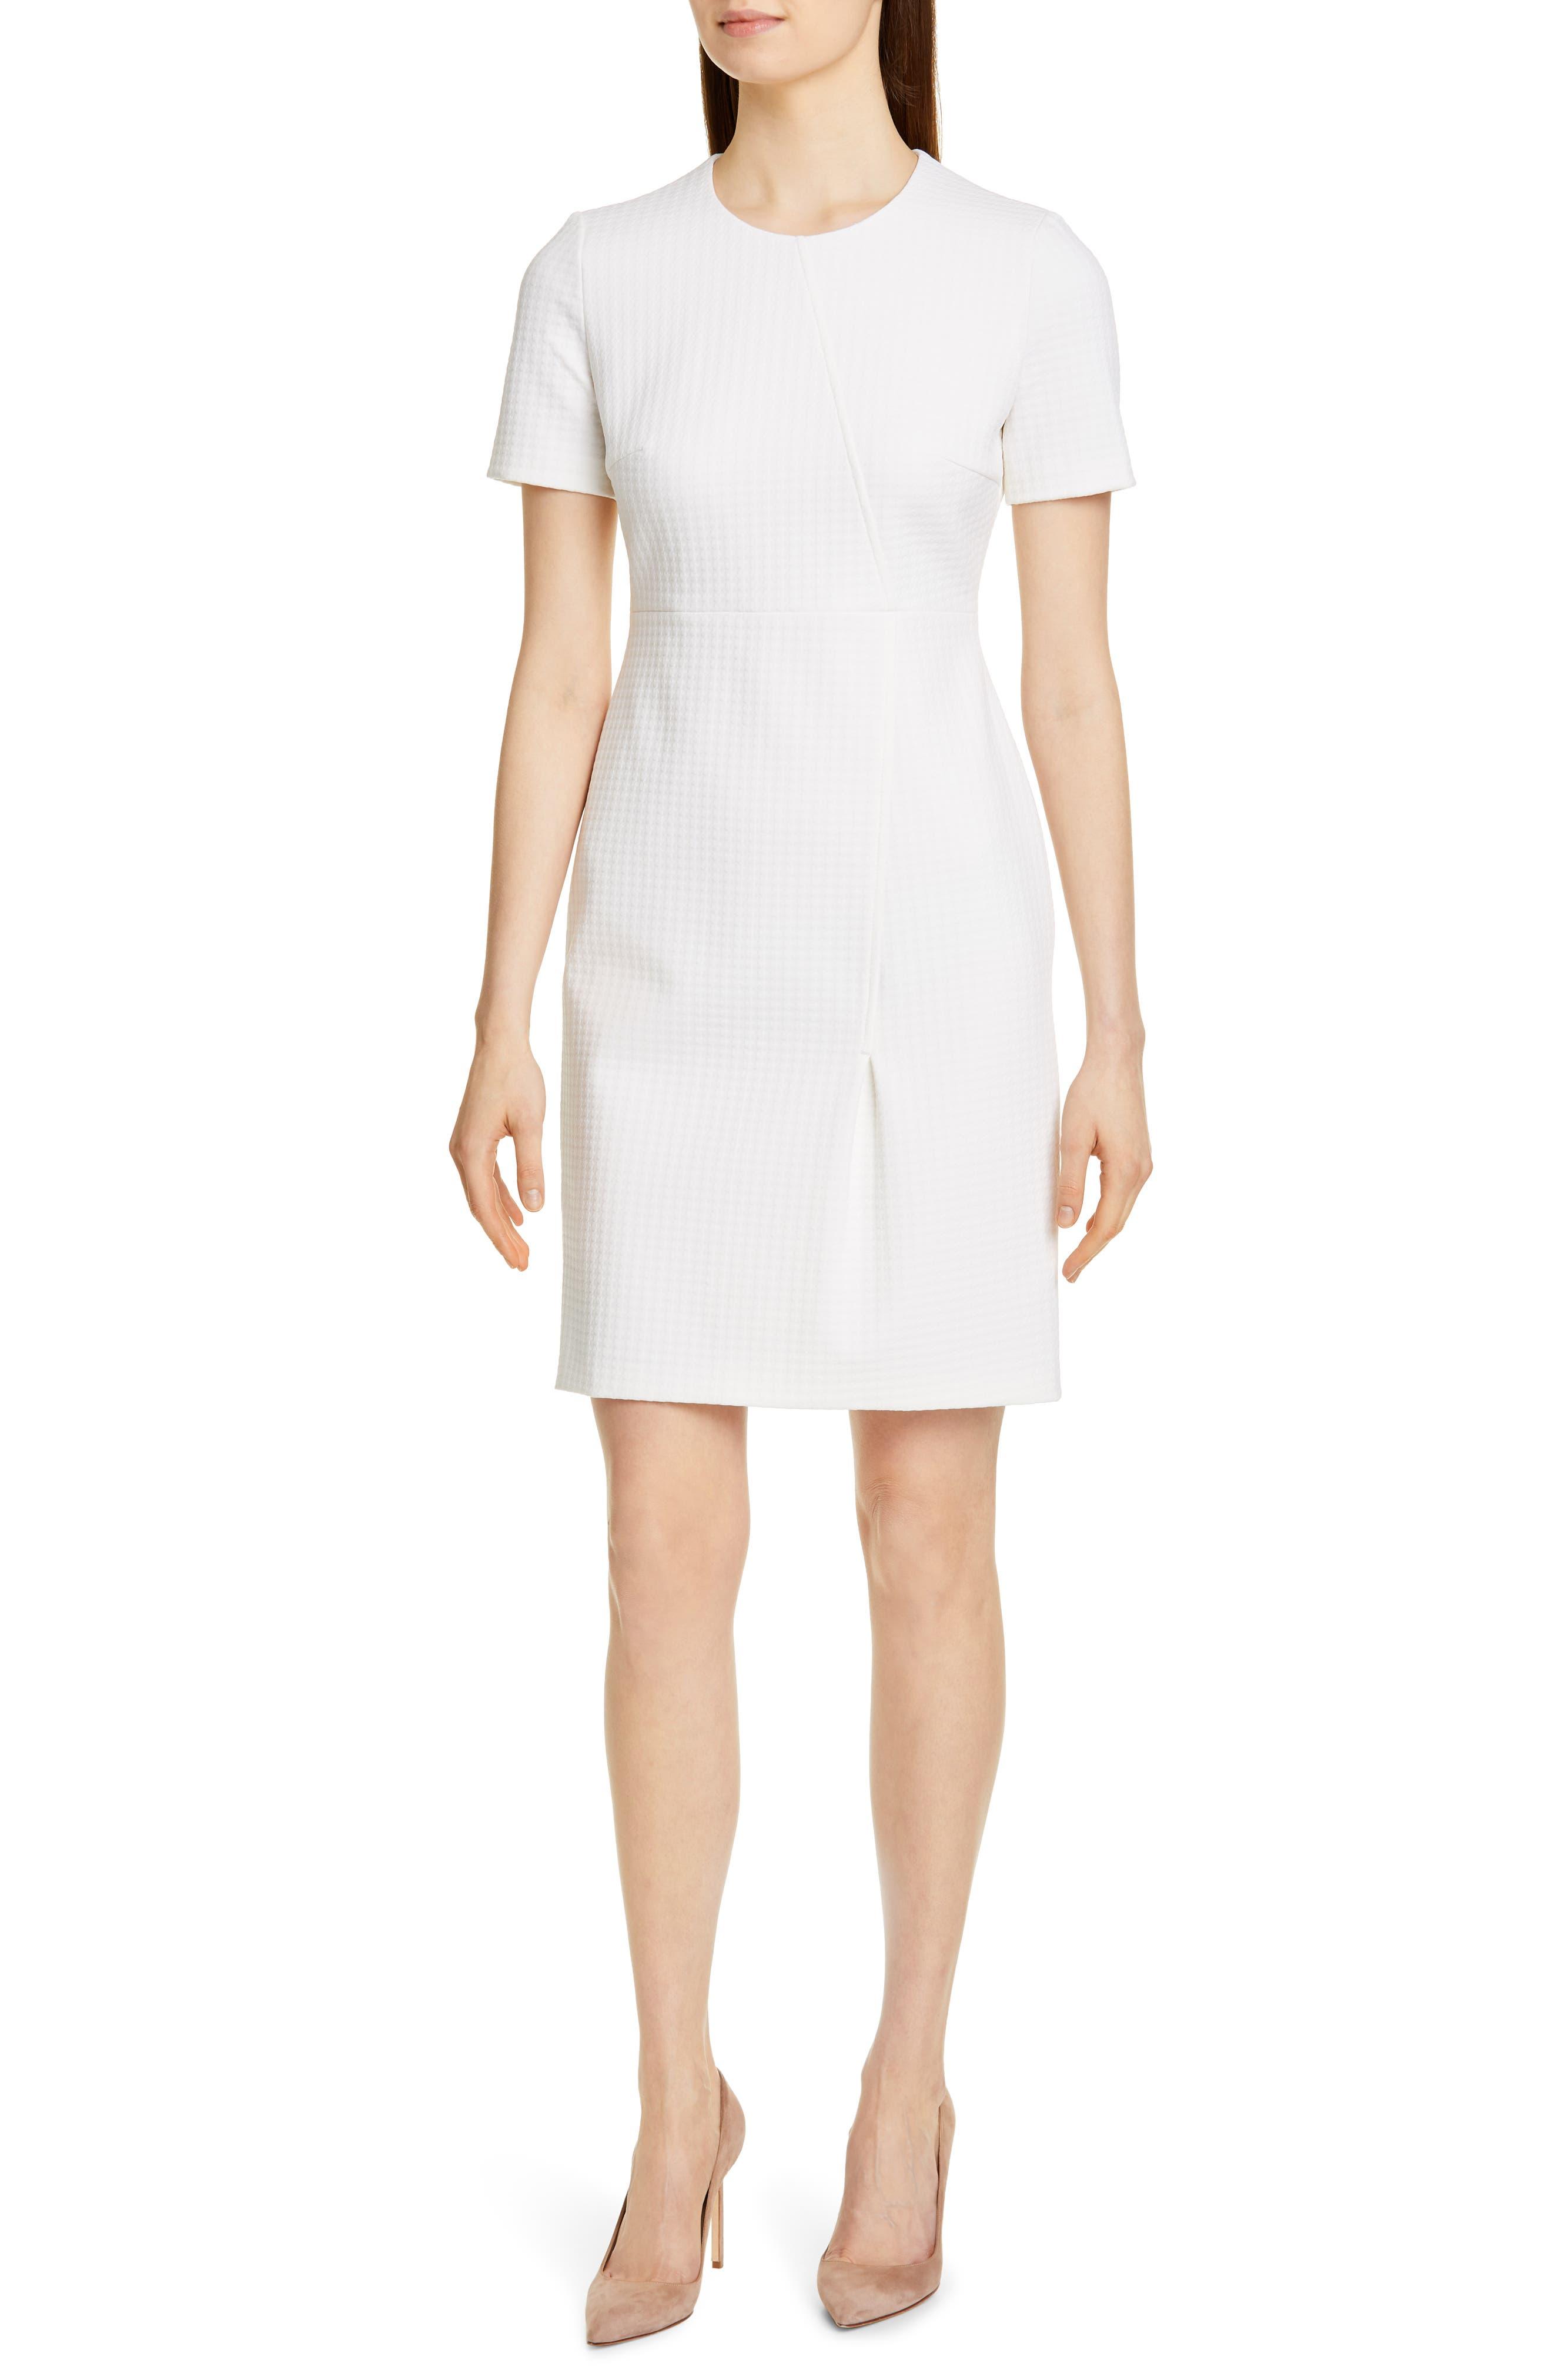 Boss Ditadara Sheath Dress, White